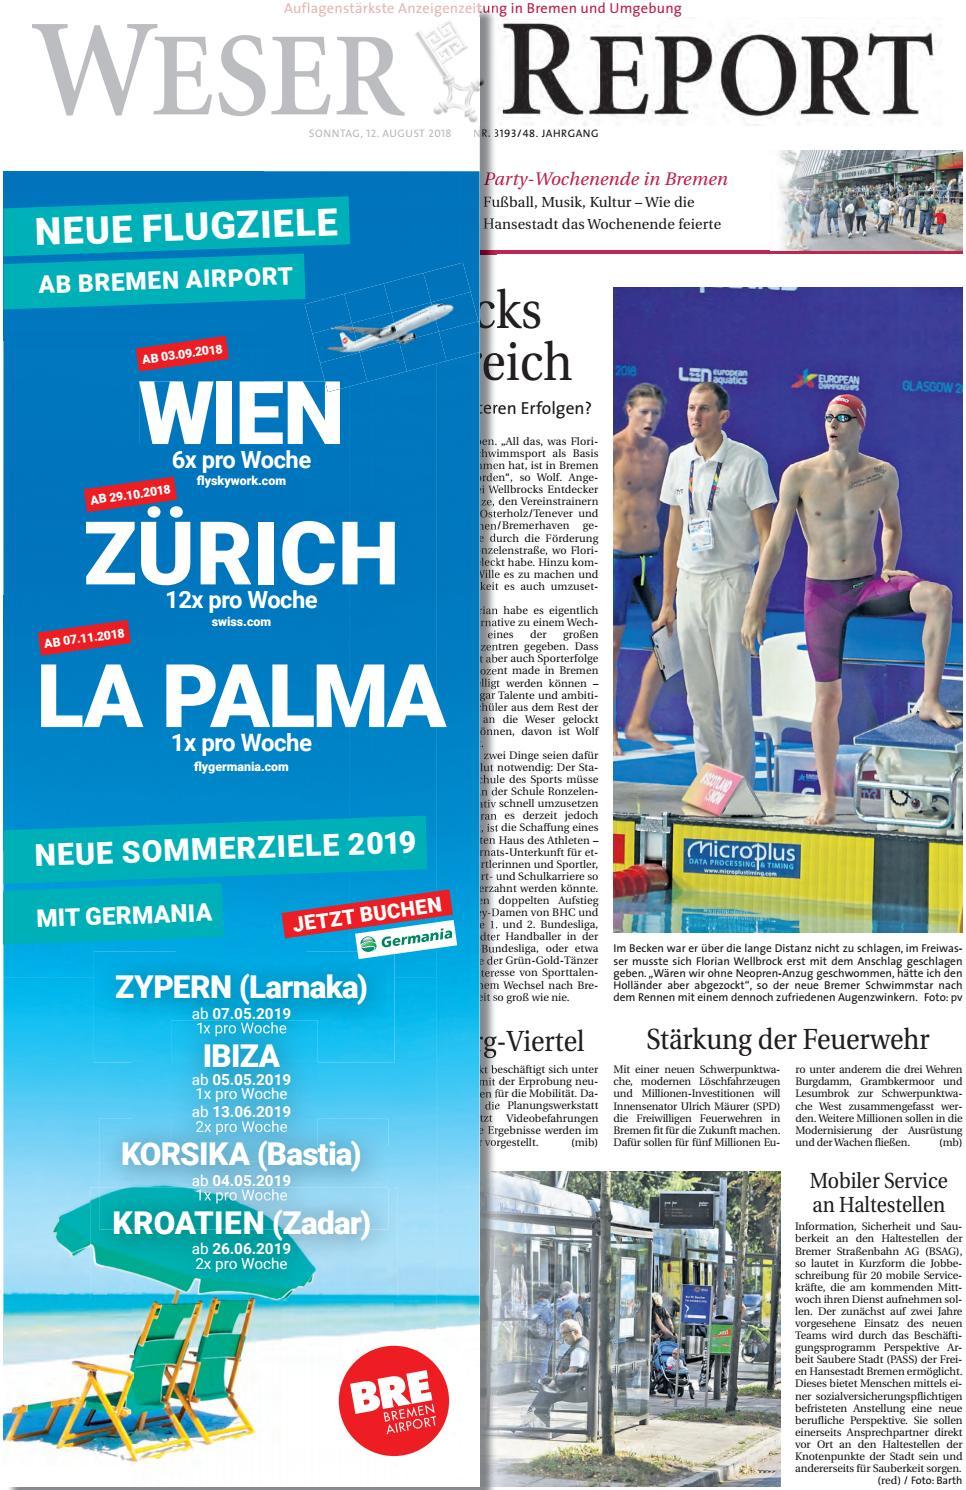 Weser Report - Links der Weser vom 12.08.2018 by KPS ...